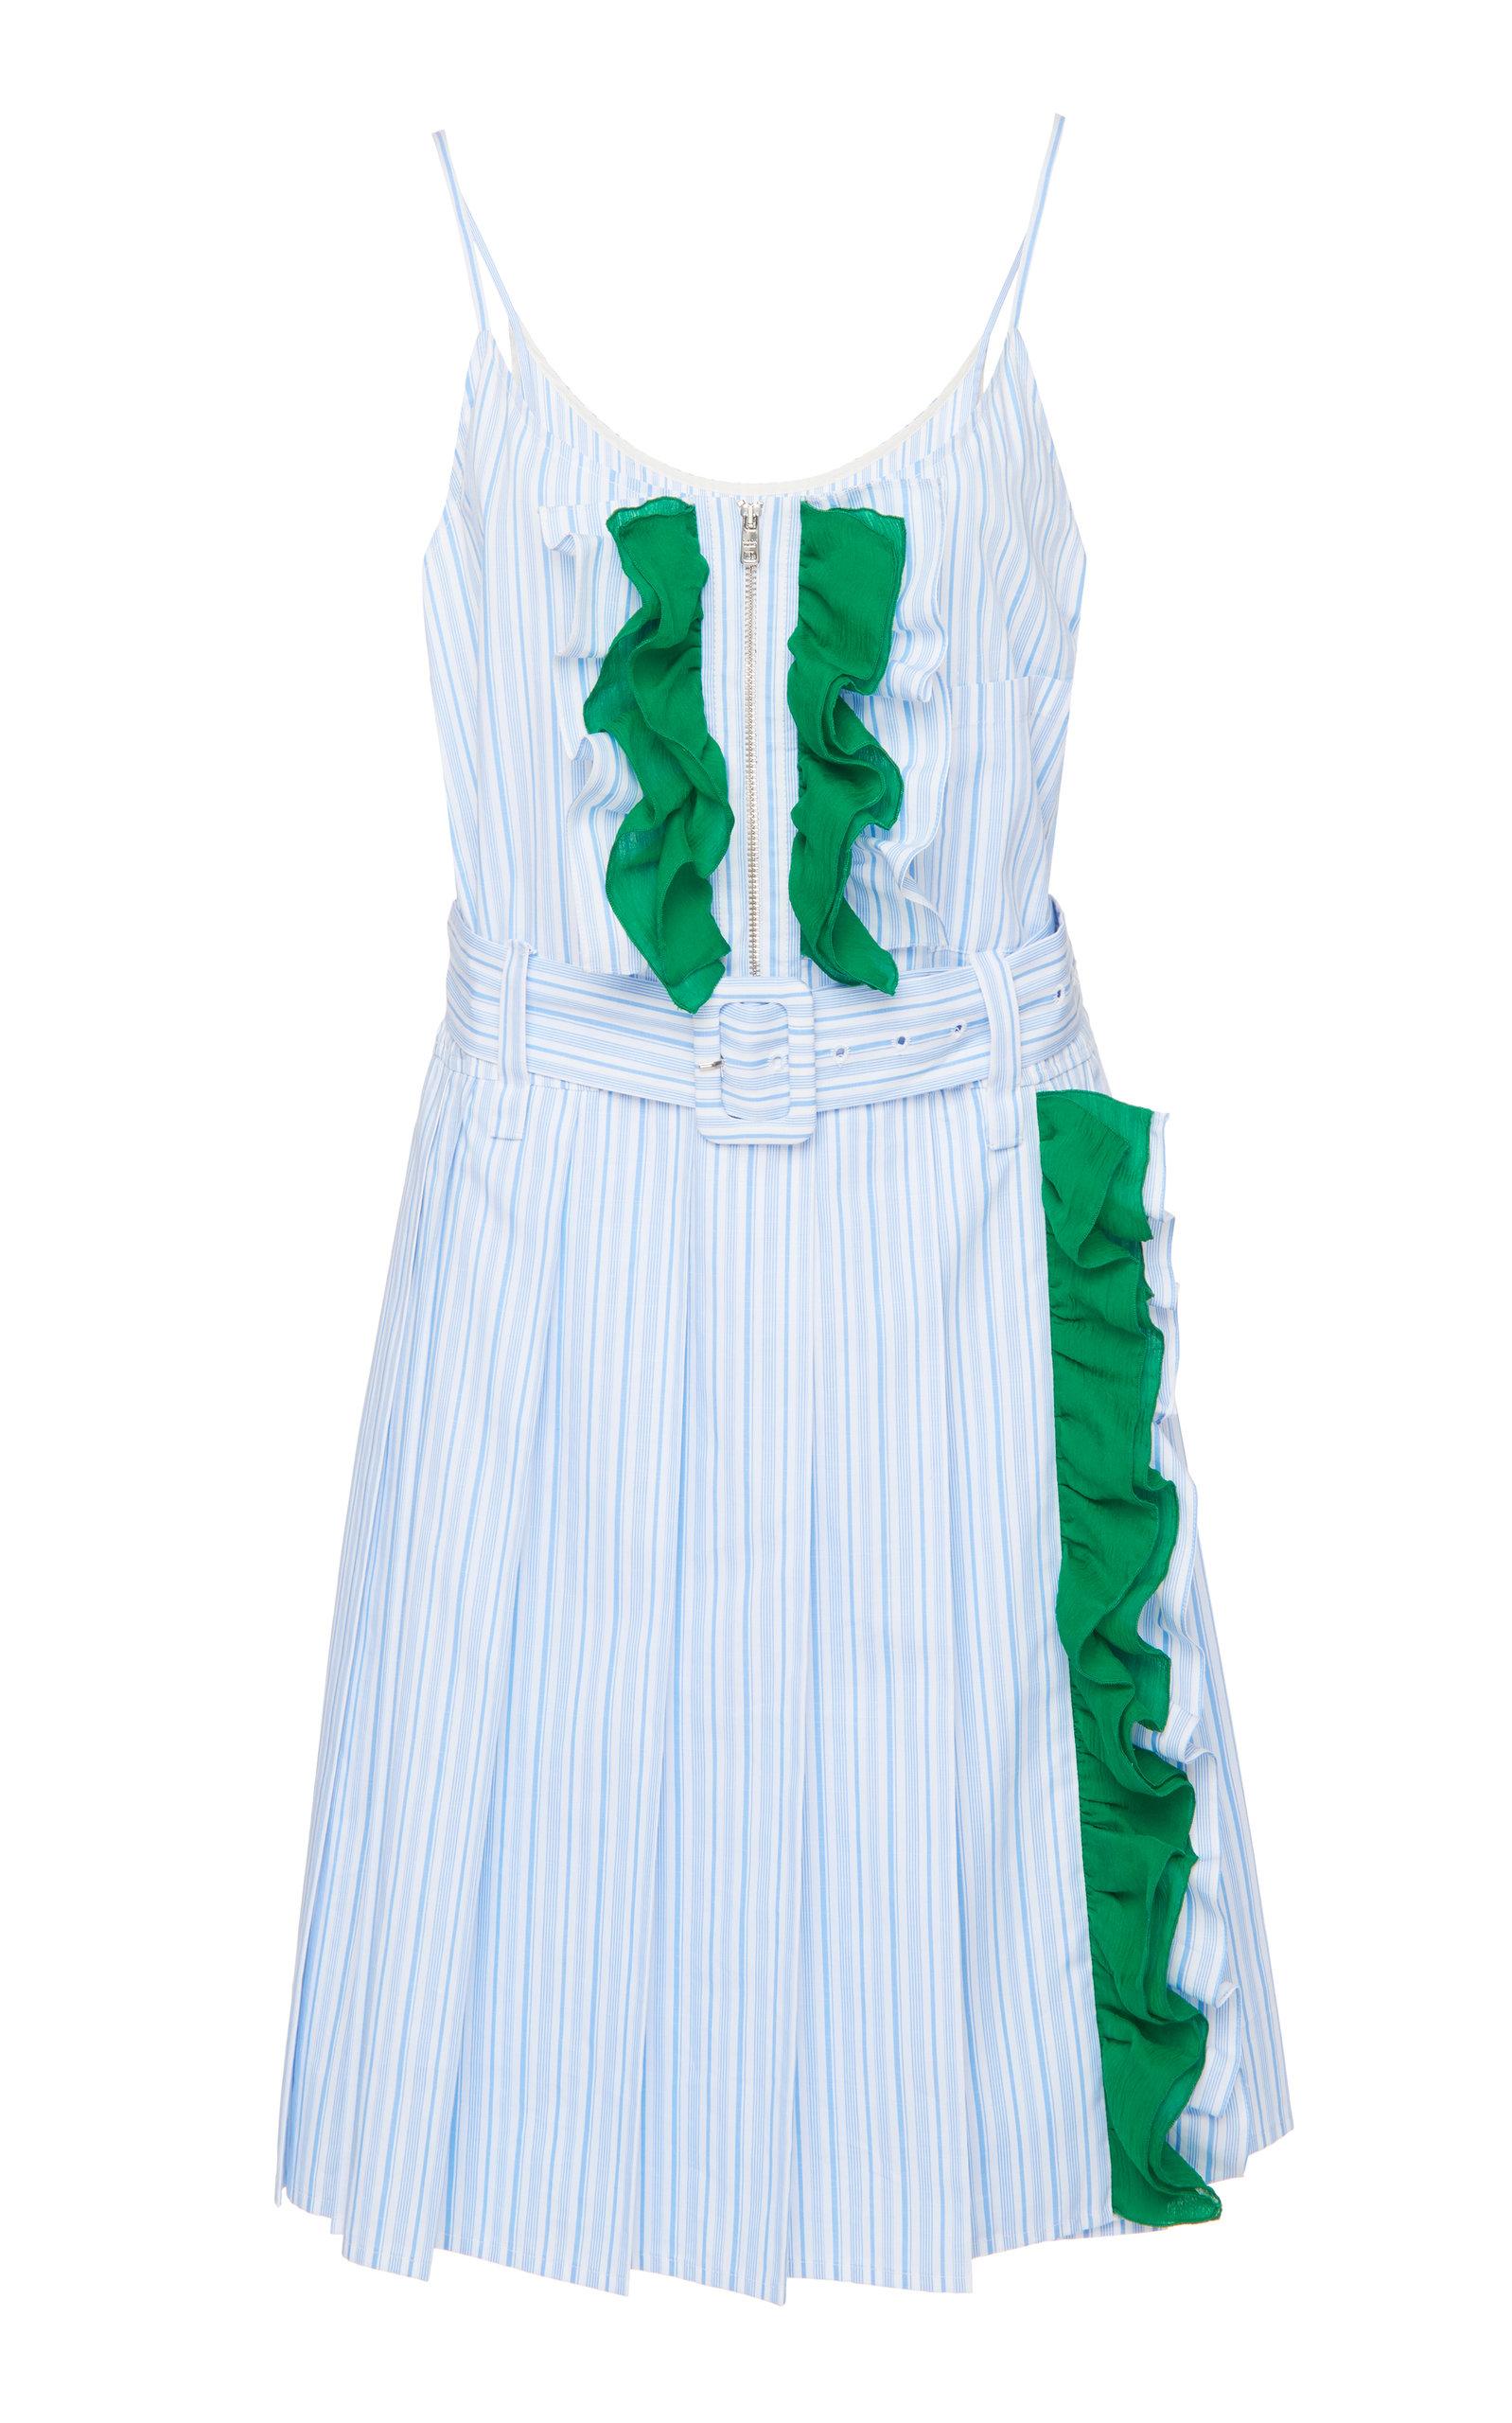 Buy Prada Ruffled Striped Cotton Mini Dress online, shop Prada at the best price